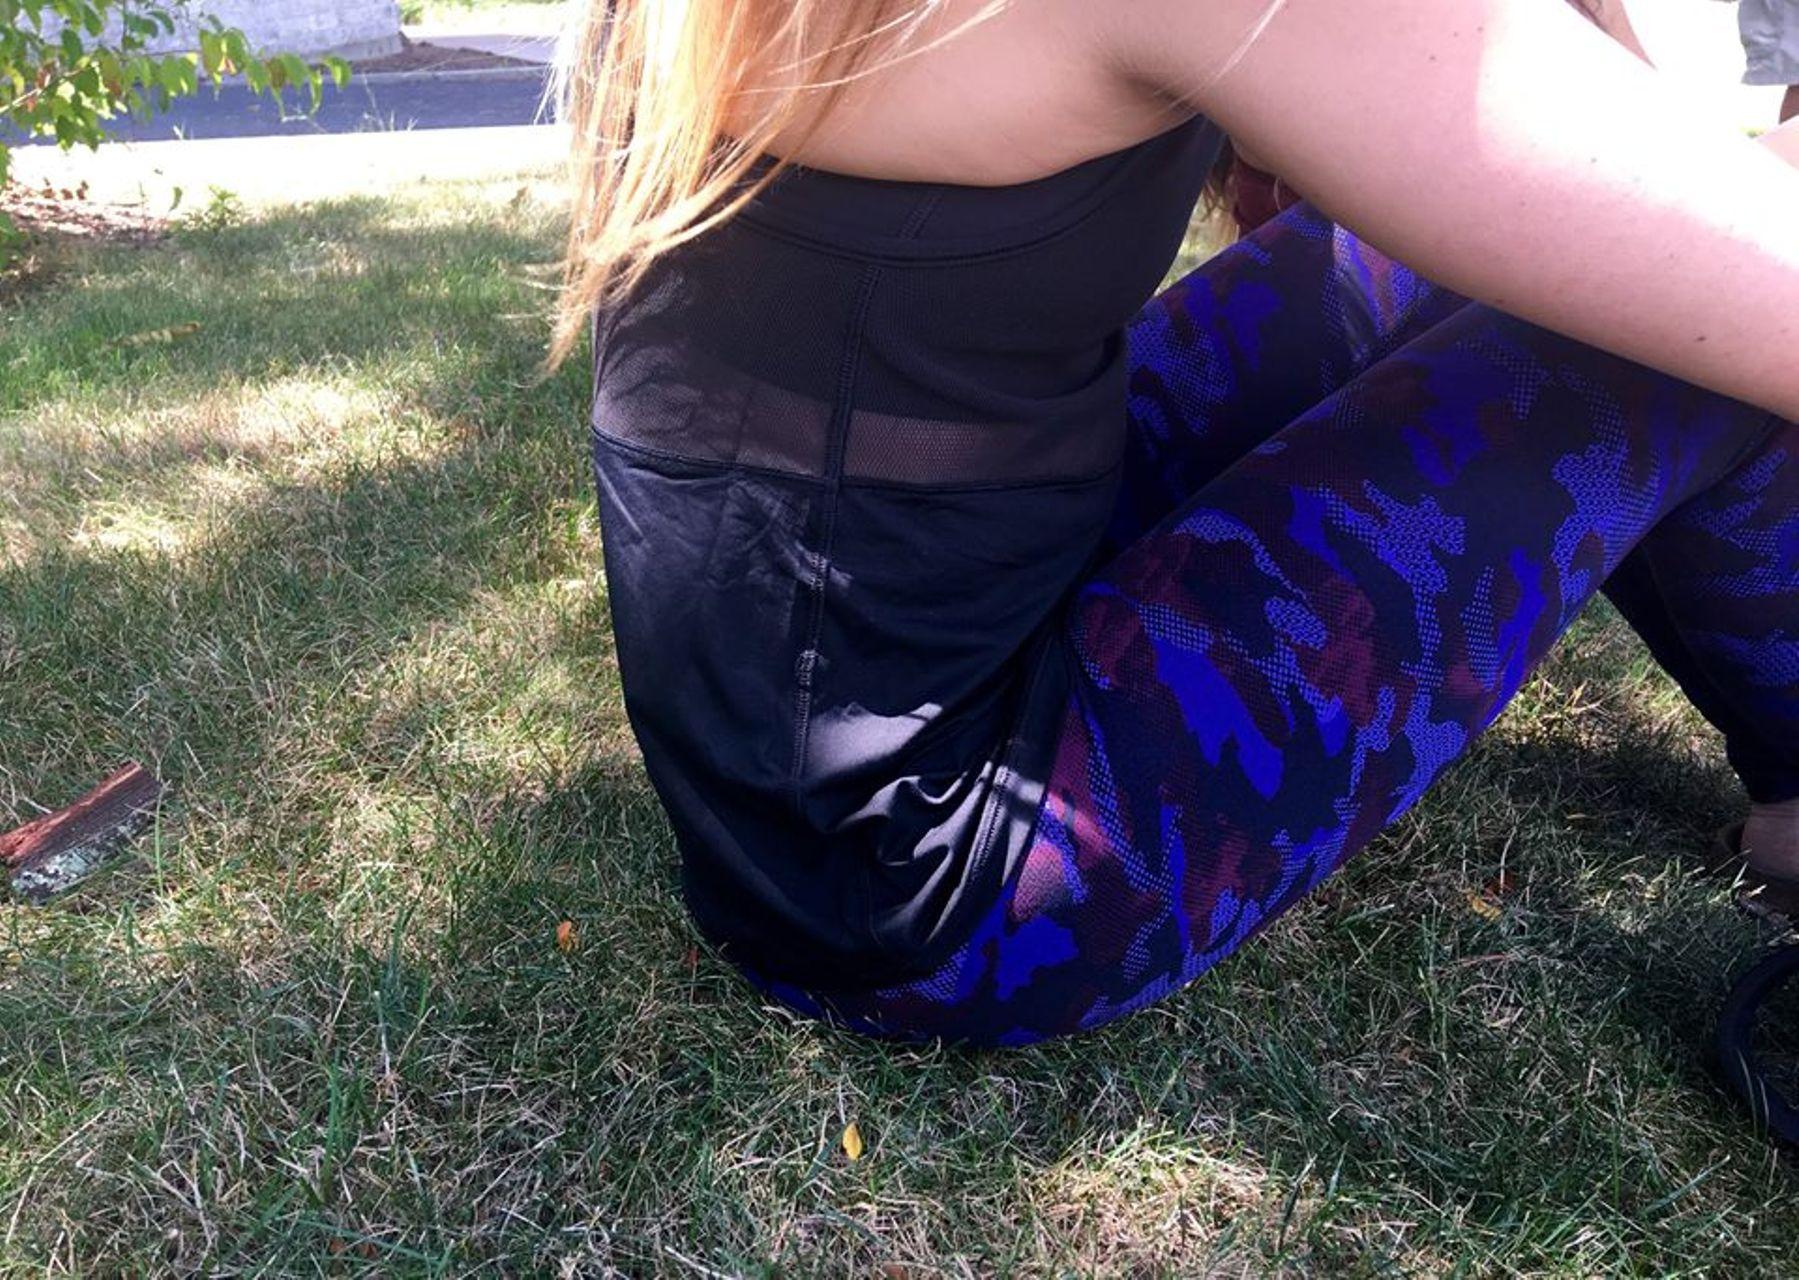 Lululemon High Times Pant - Hounds Camo Emperor Blue Black